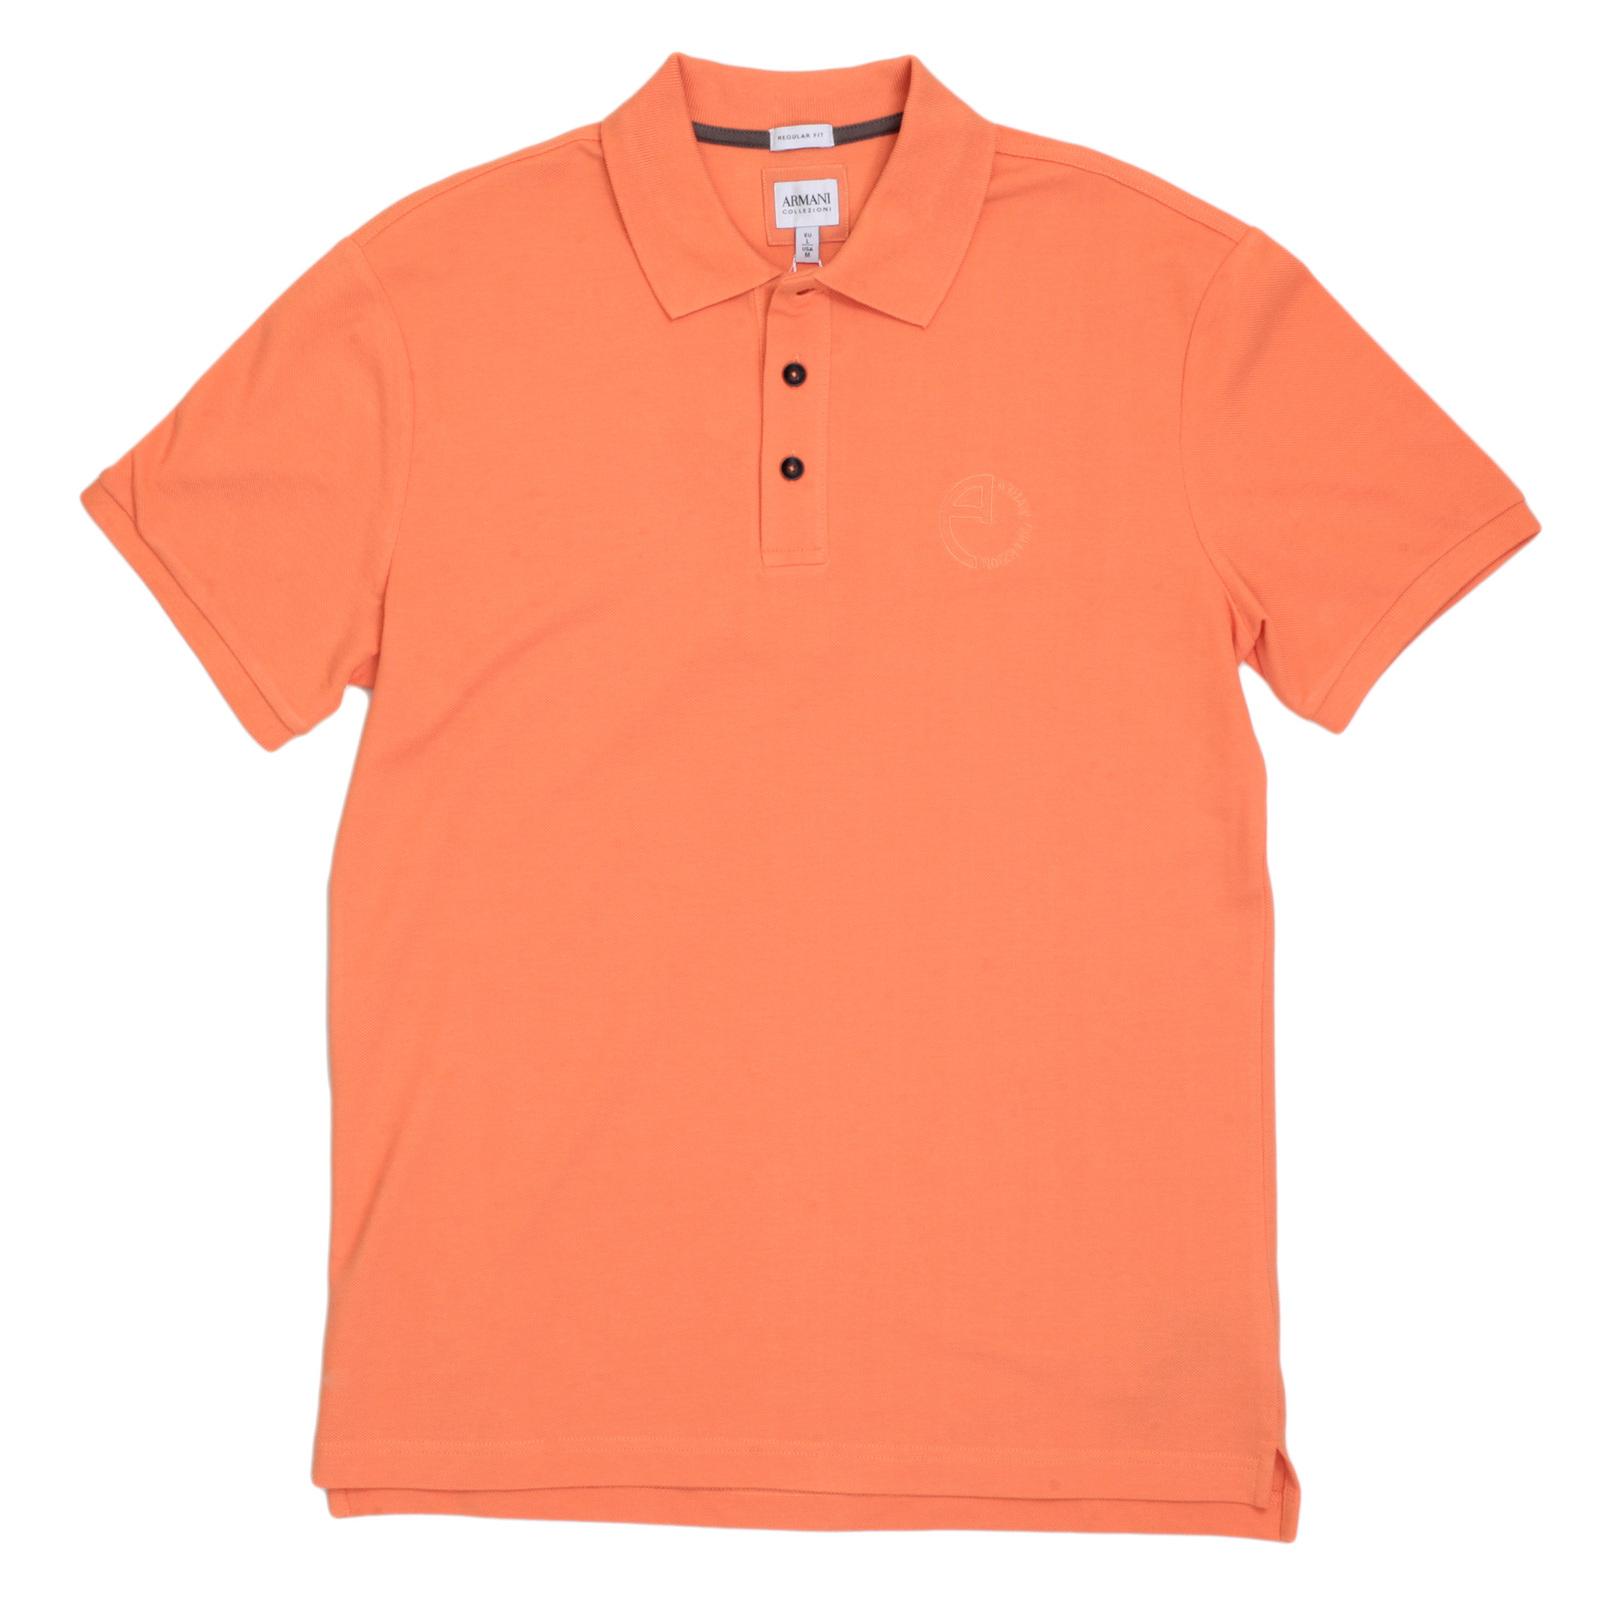 Shop for giorgio armani orange short sleeve polo shirt for Orange polo shirt mens